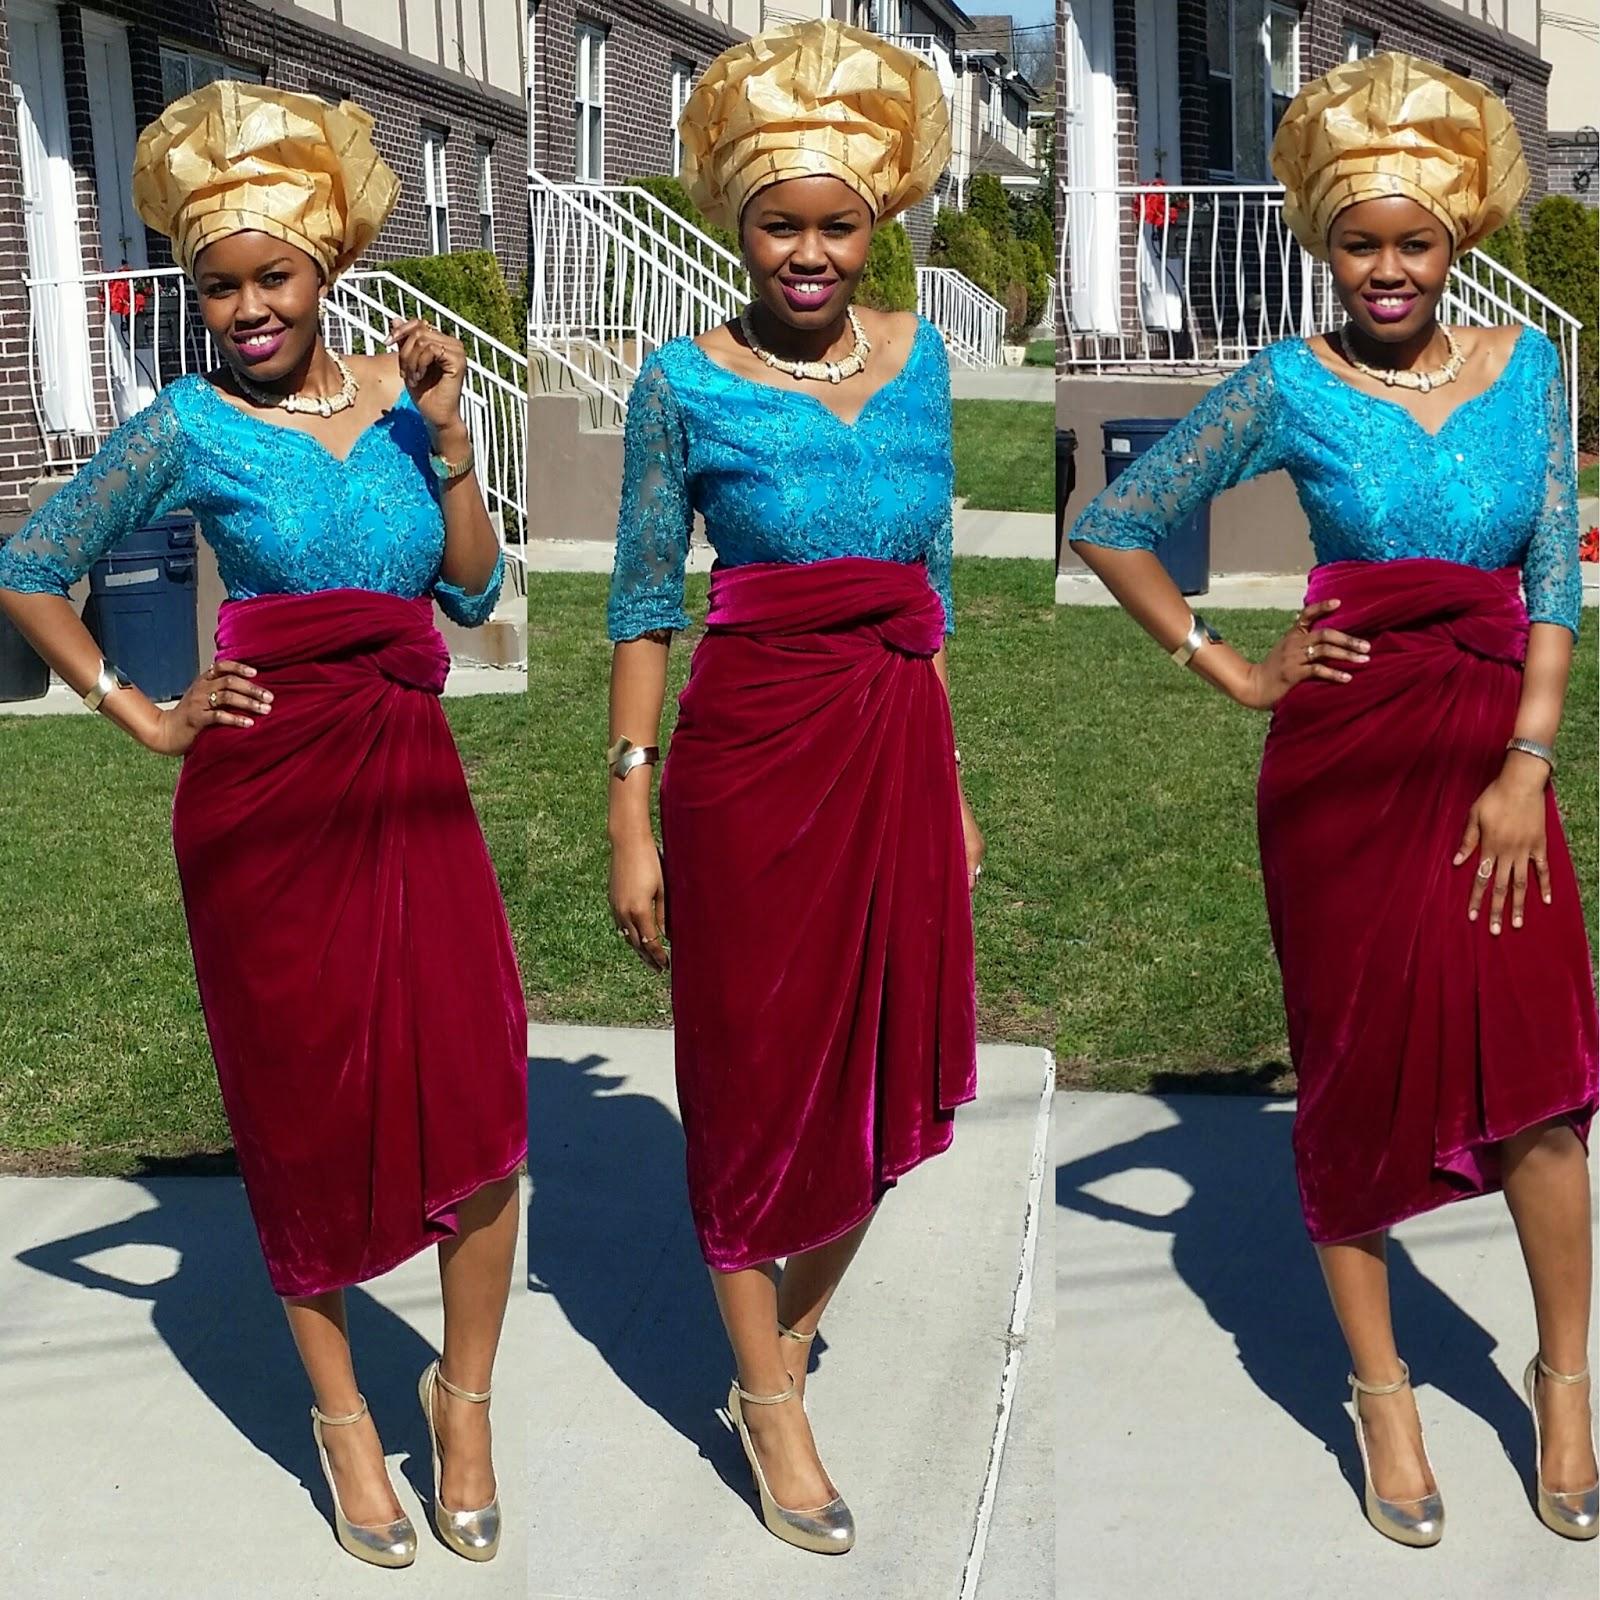 2d63145e3949 The wedding guest  African Fashion - Stylediarybyosy